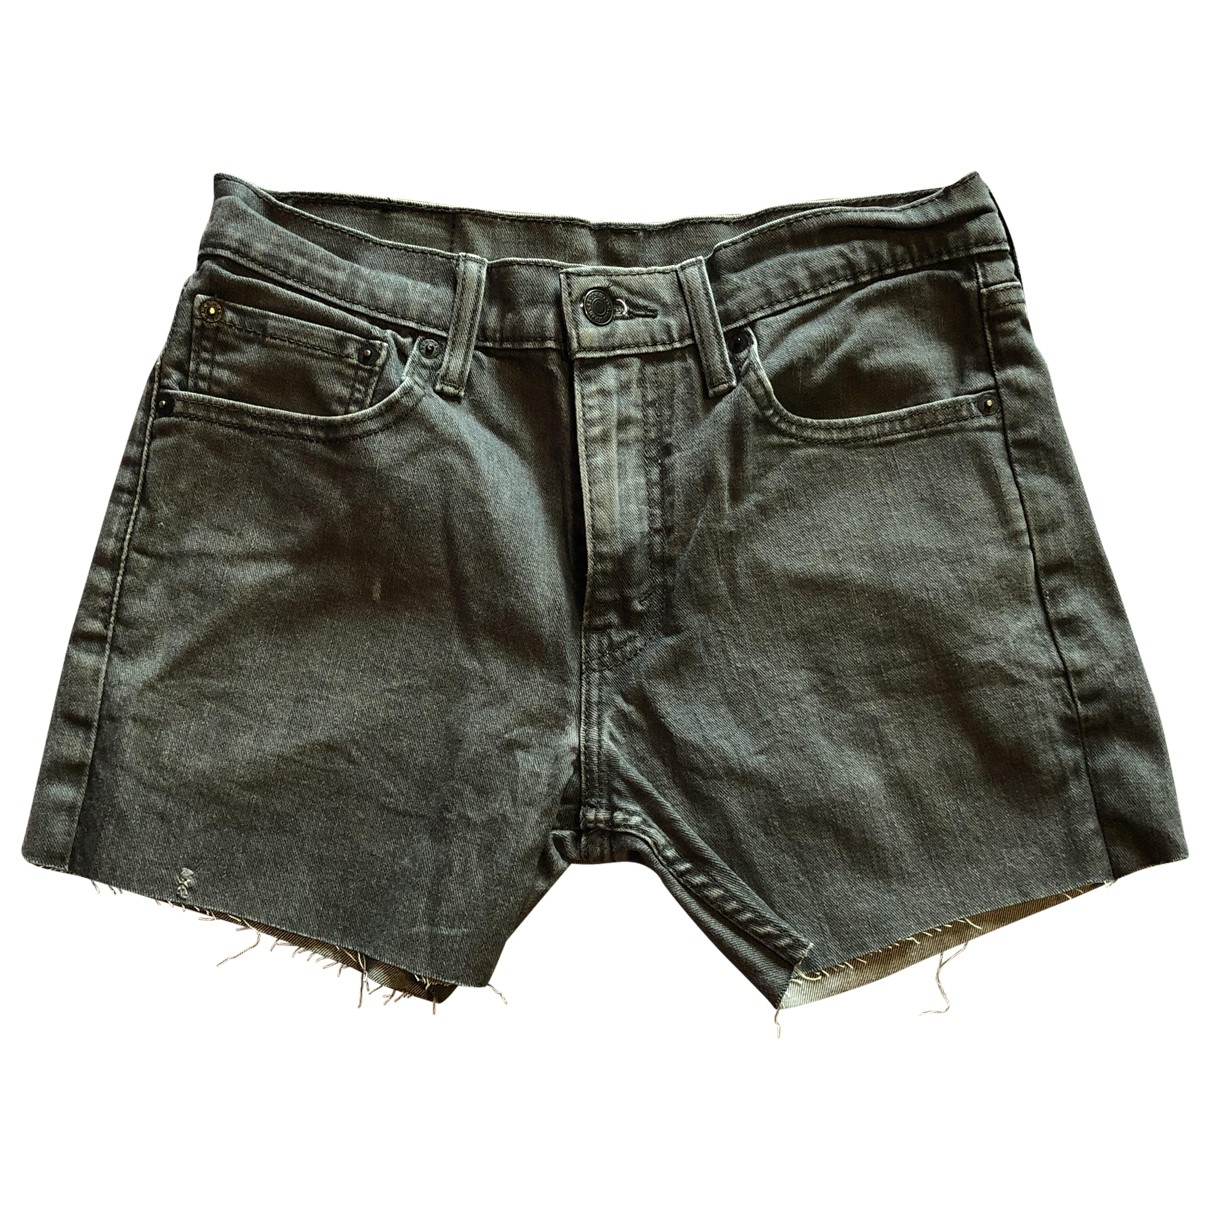 Levi's Vintage Clothing \N Anthracite Denim - Jeans Shorts for Women 32 FR